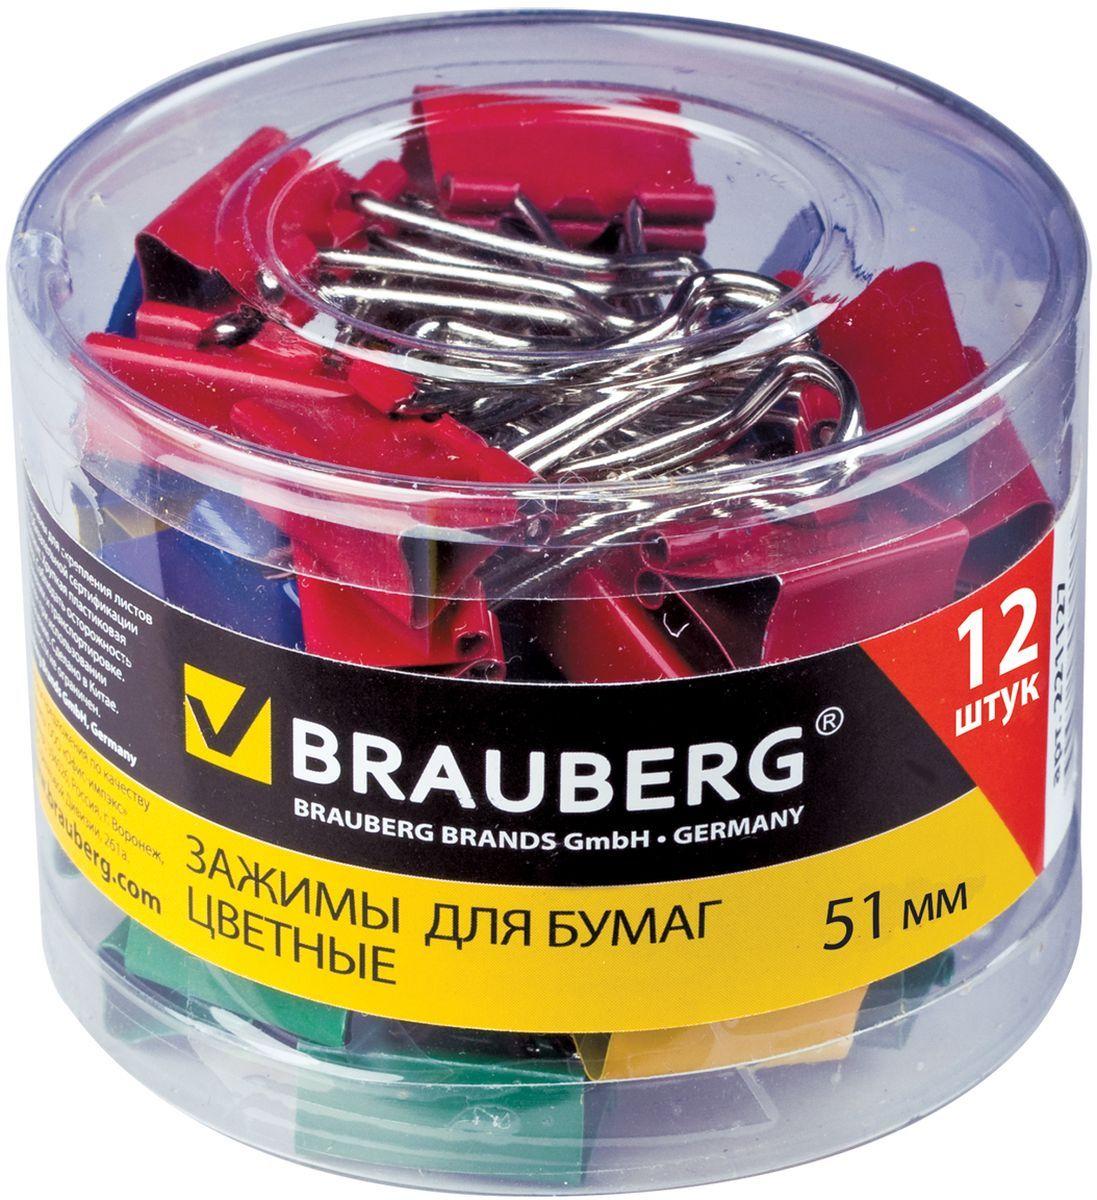 Brauberg Зажим для бумаг ширина 51 мм 12 шт -  Скрепки, кнопки, зажимы